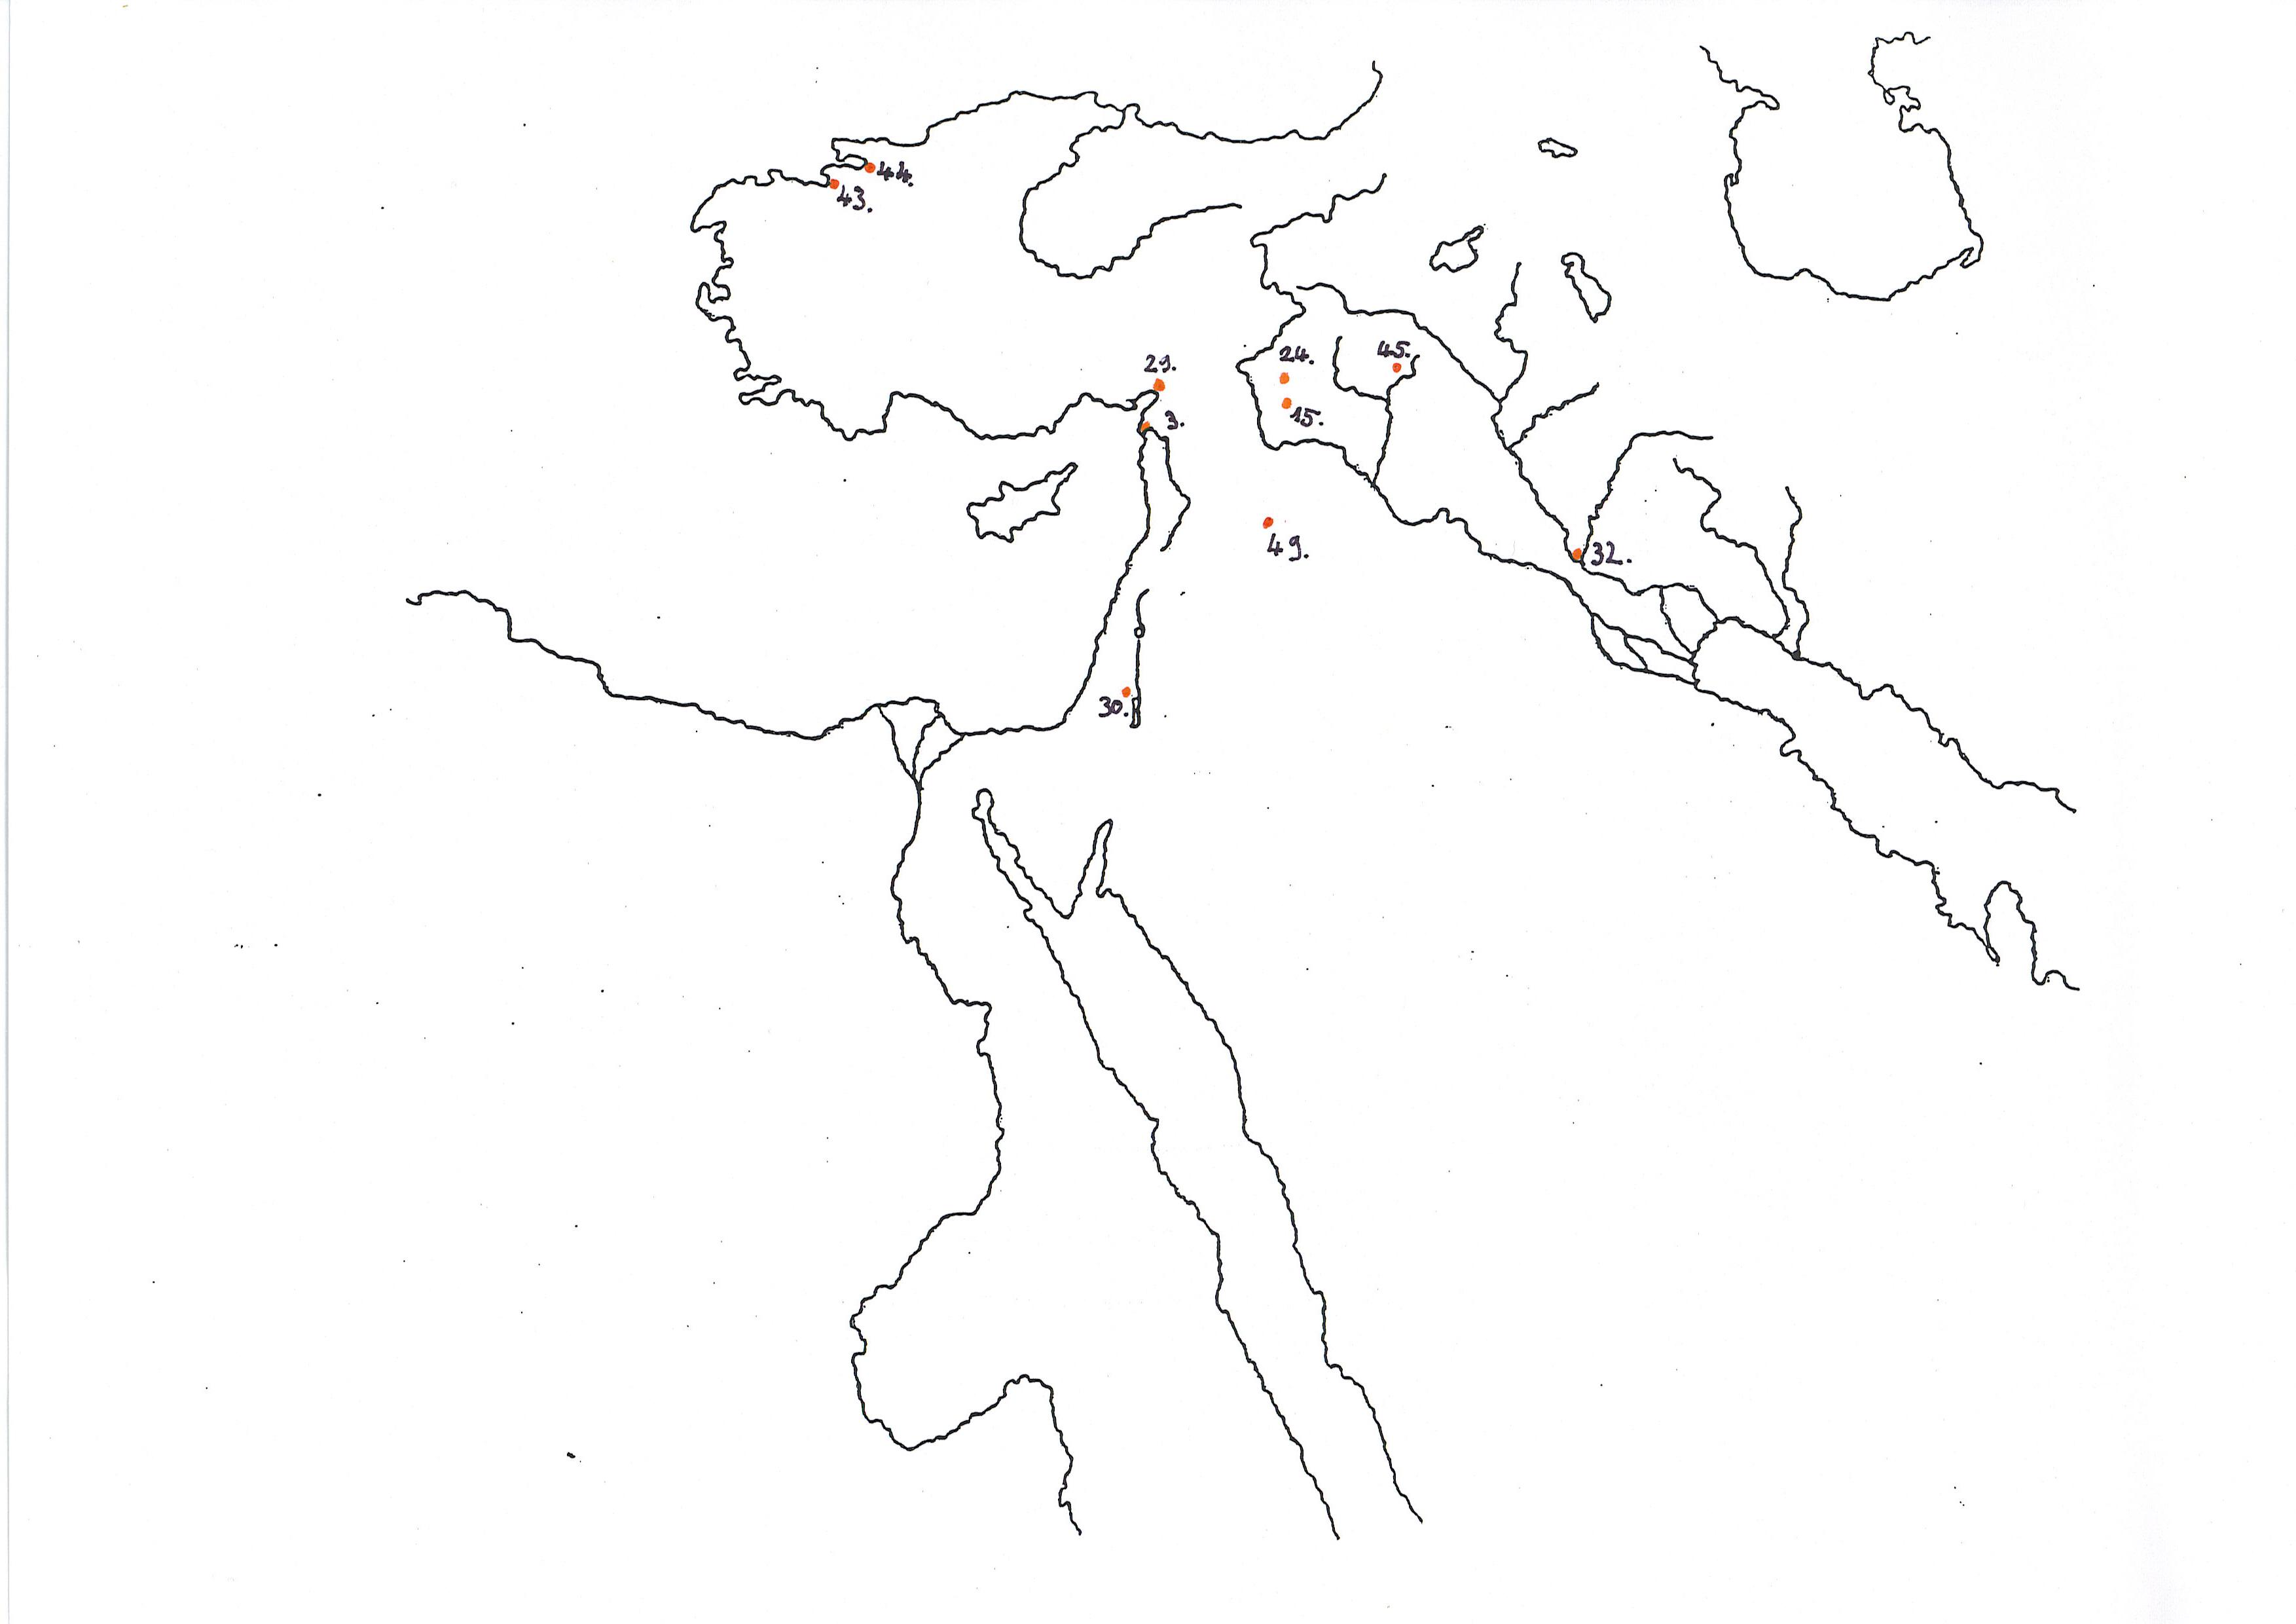 ókori róma térkép ókori róma térkép 3. ókori róma térkép